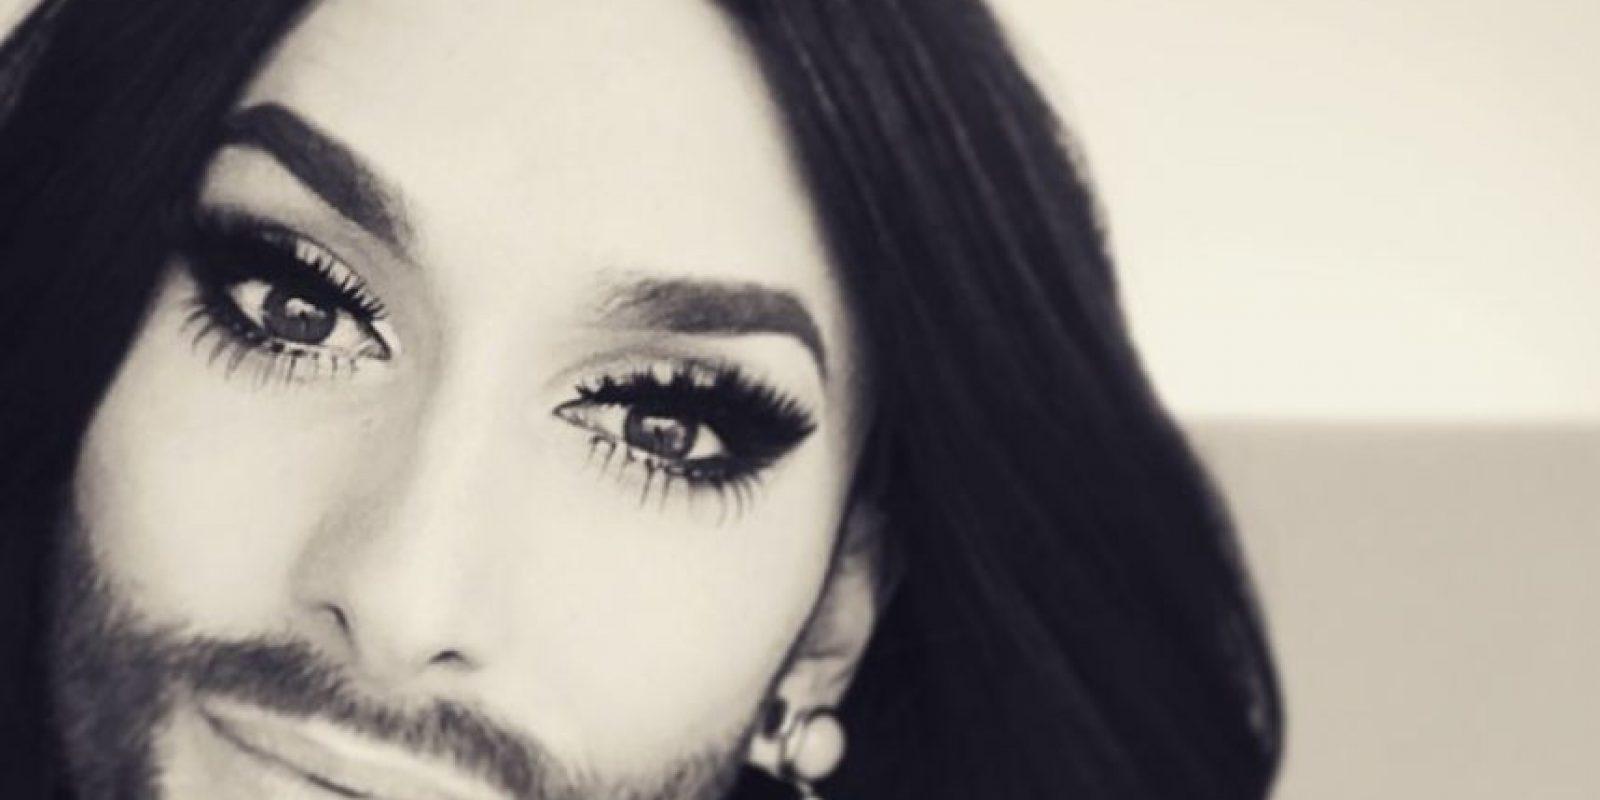 ¡Vean a Conchita Wurst! Foto:Instagram